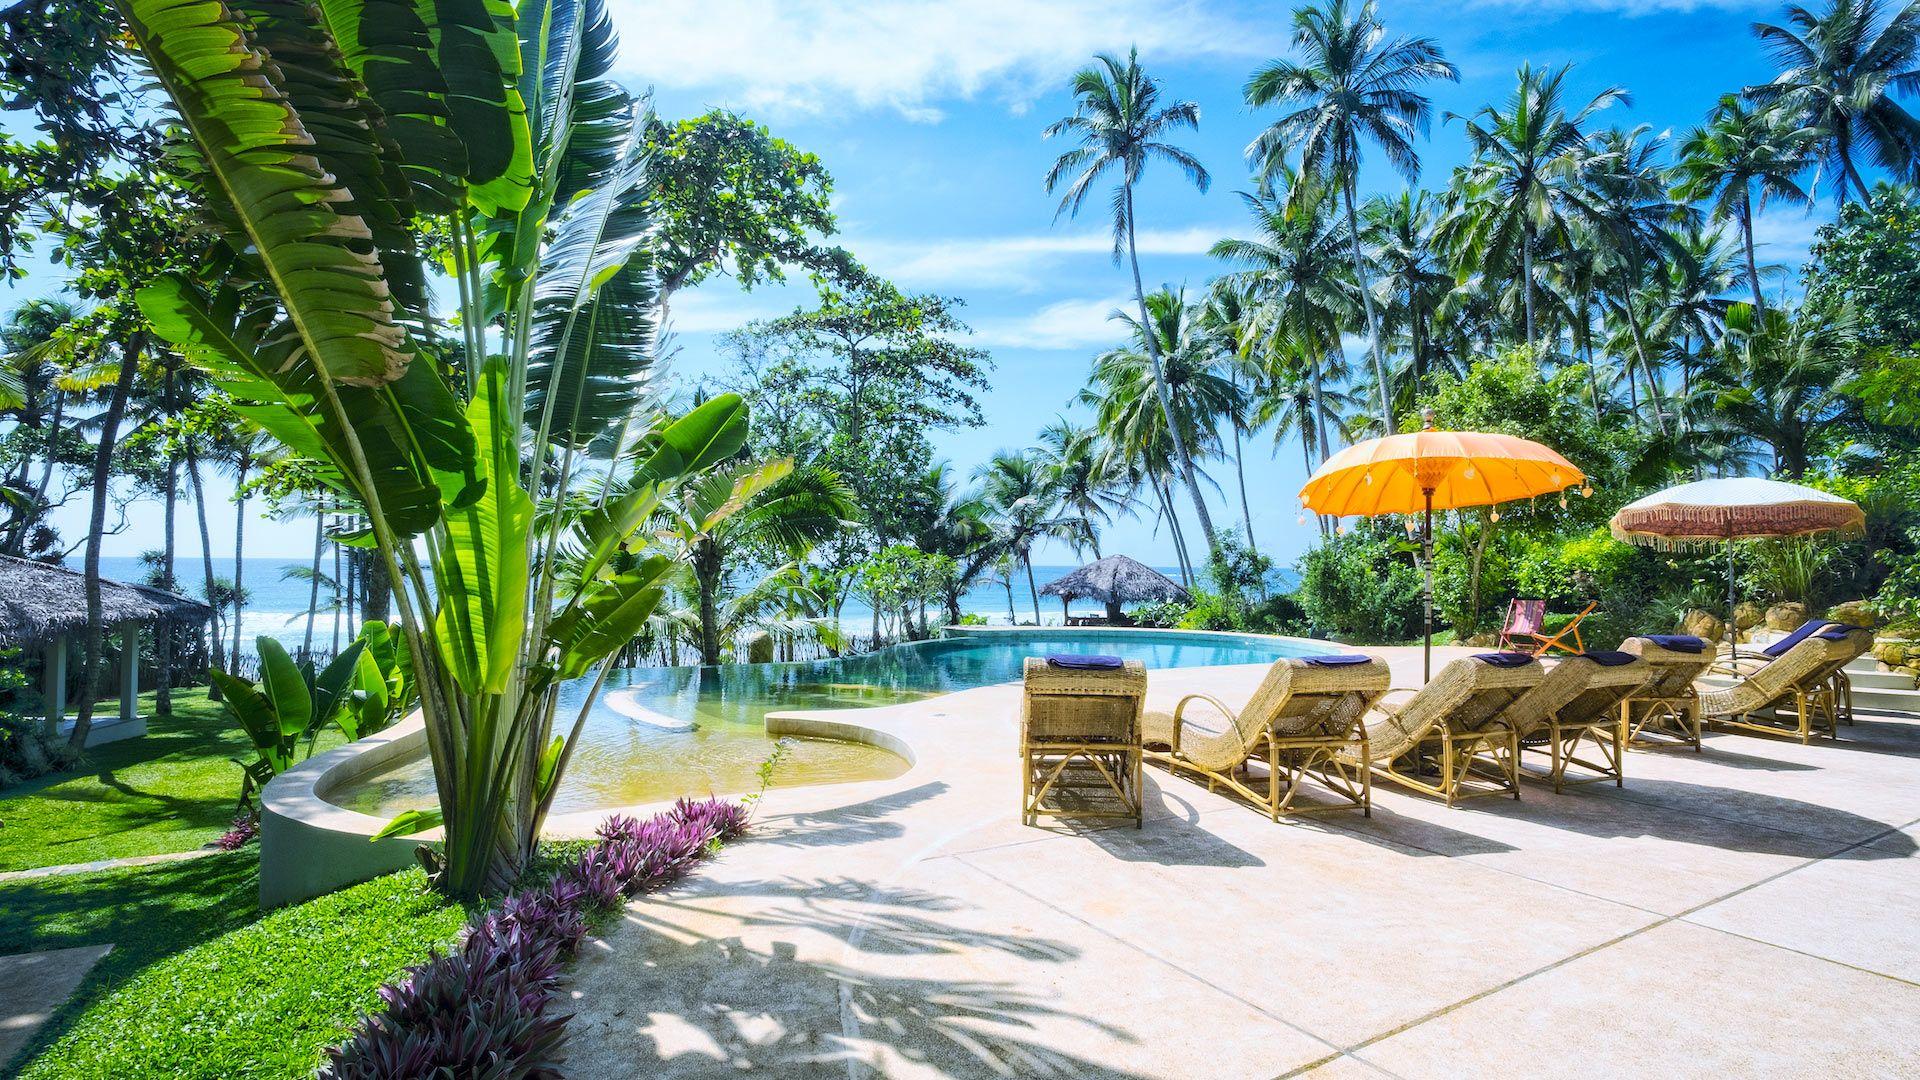 Villa Medara - #Tangalle #srilanka #swimmingpool #views #luxuryhome ...